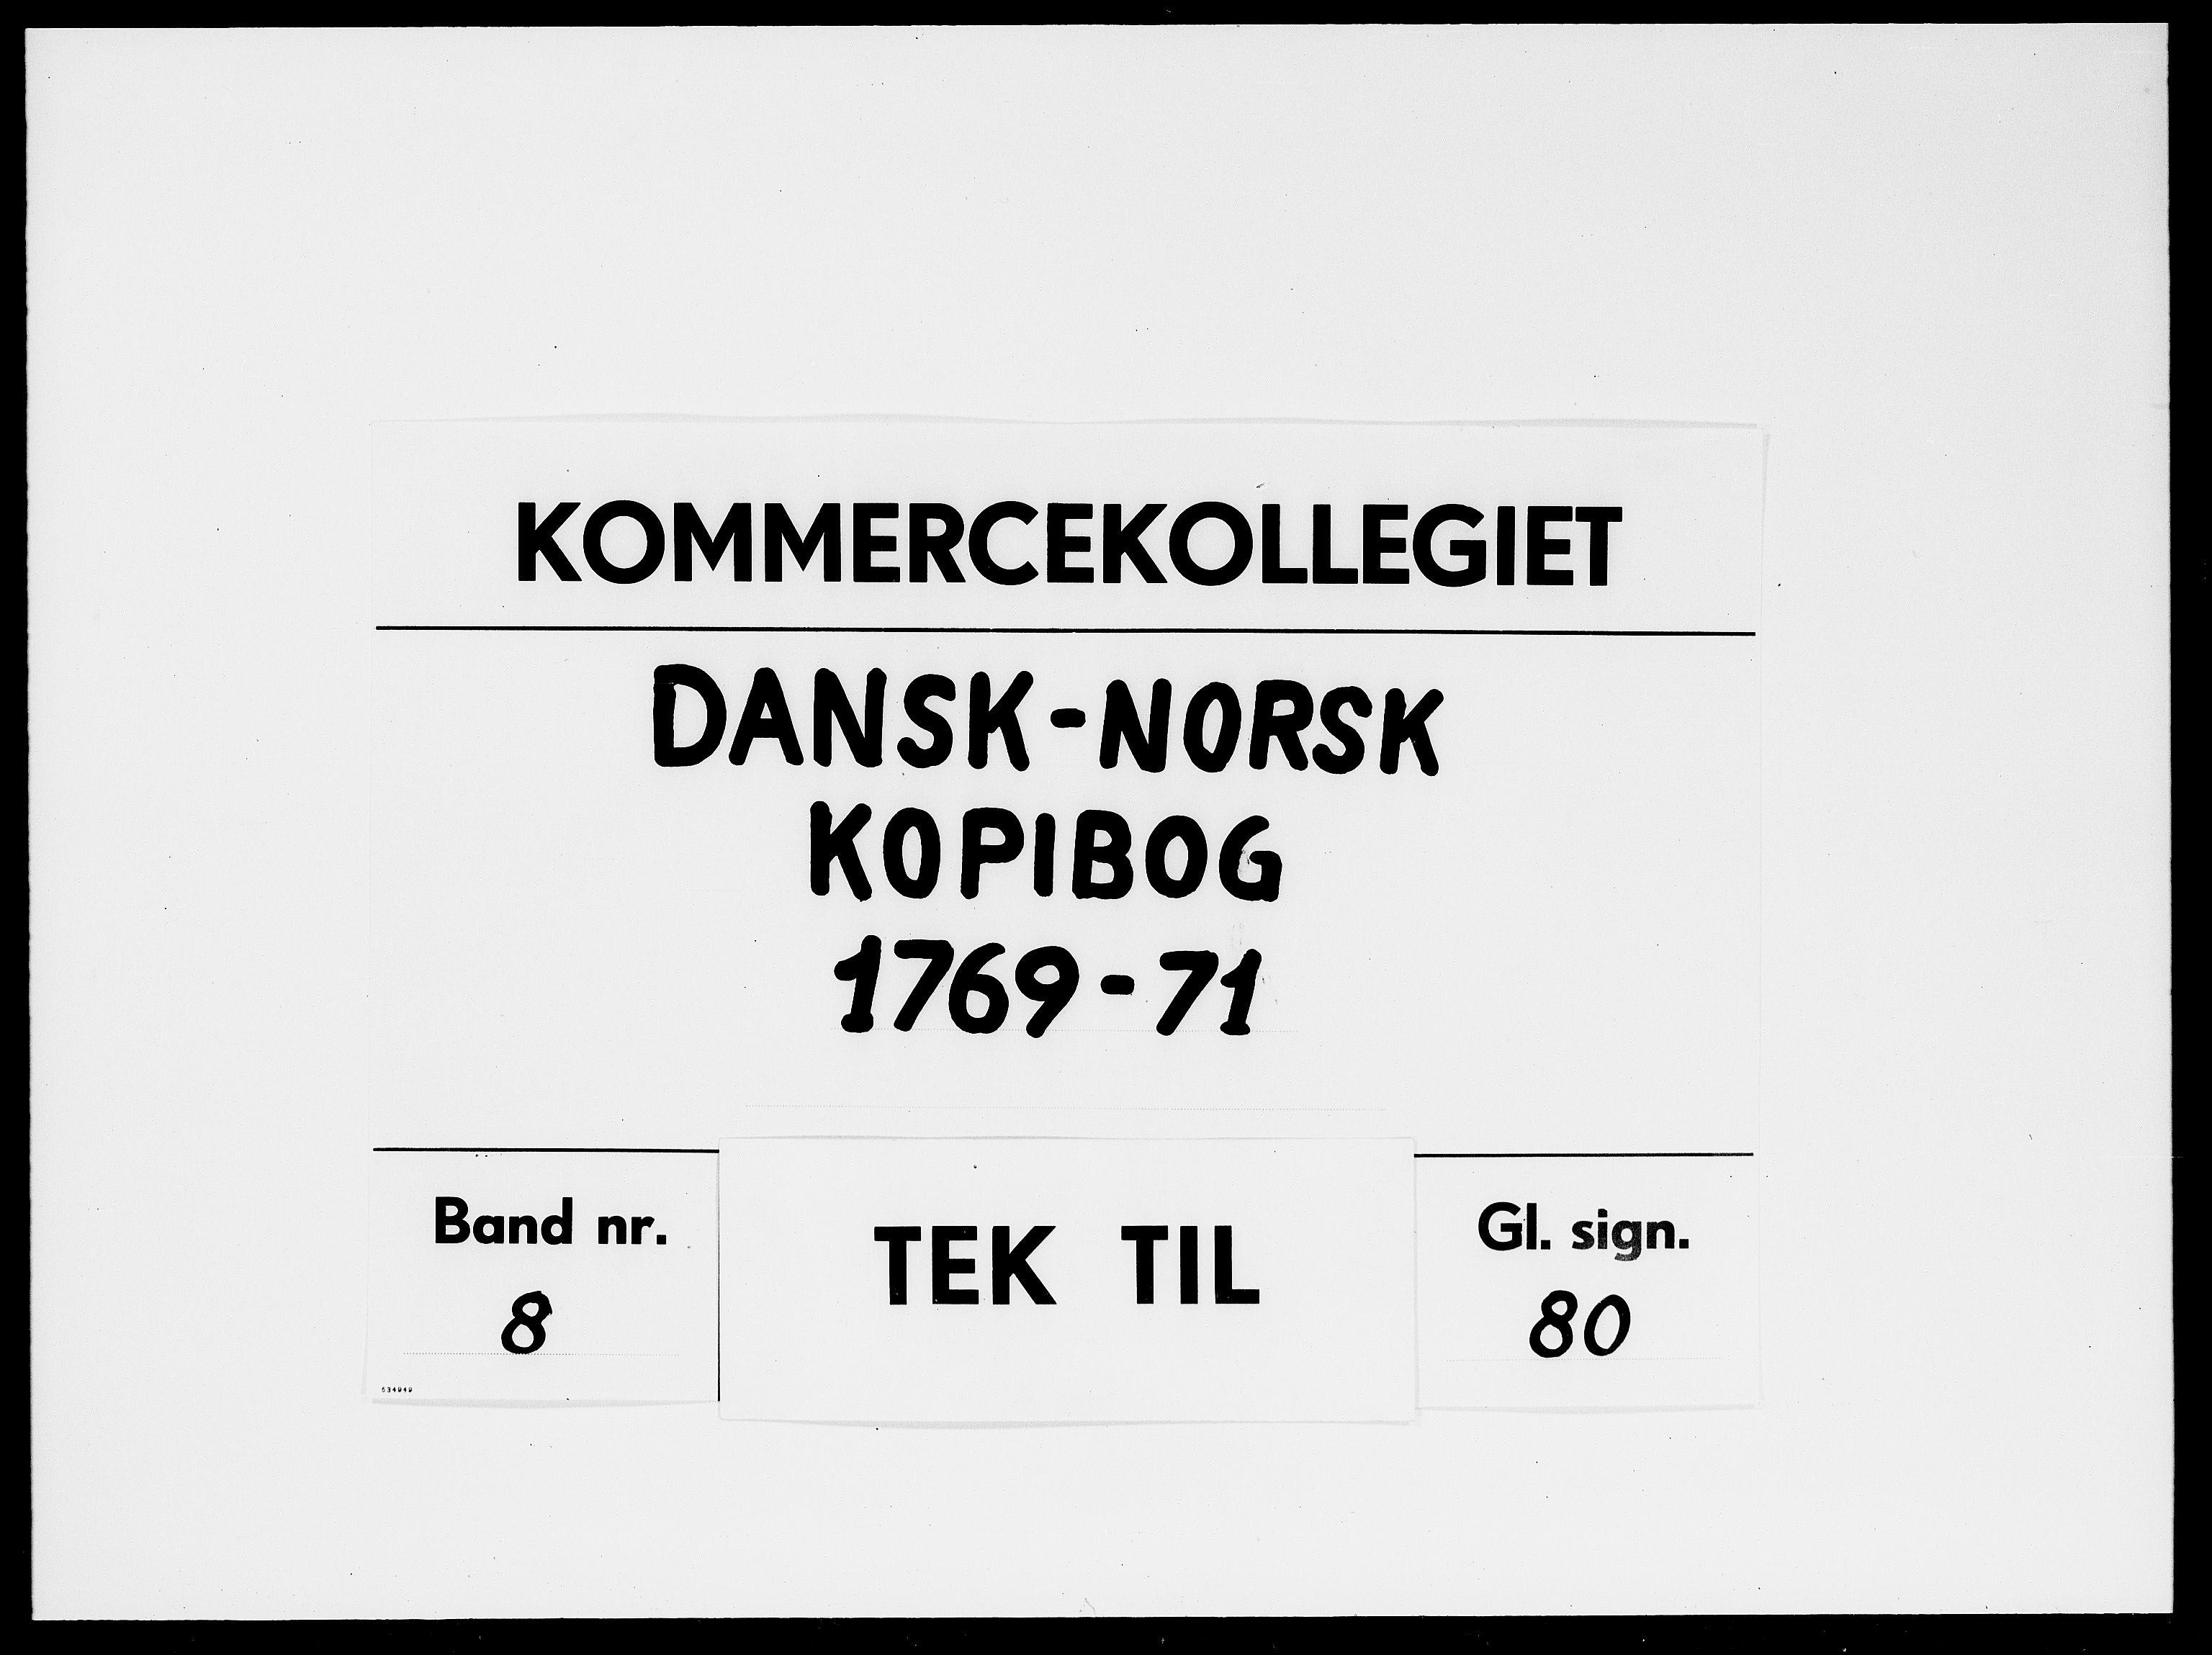 DRA, Kommercekollegiet, Dansk-Norske Sekretariat, -/48: Dansk-Norsk kopibog, 1769-1771